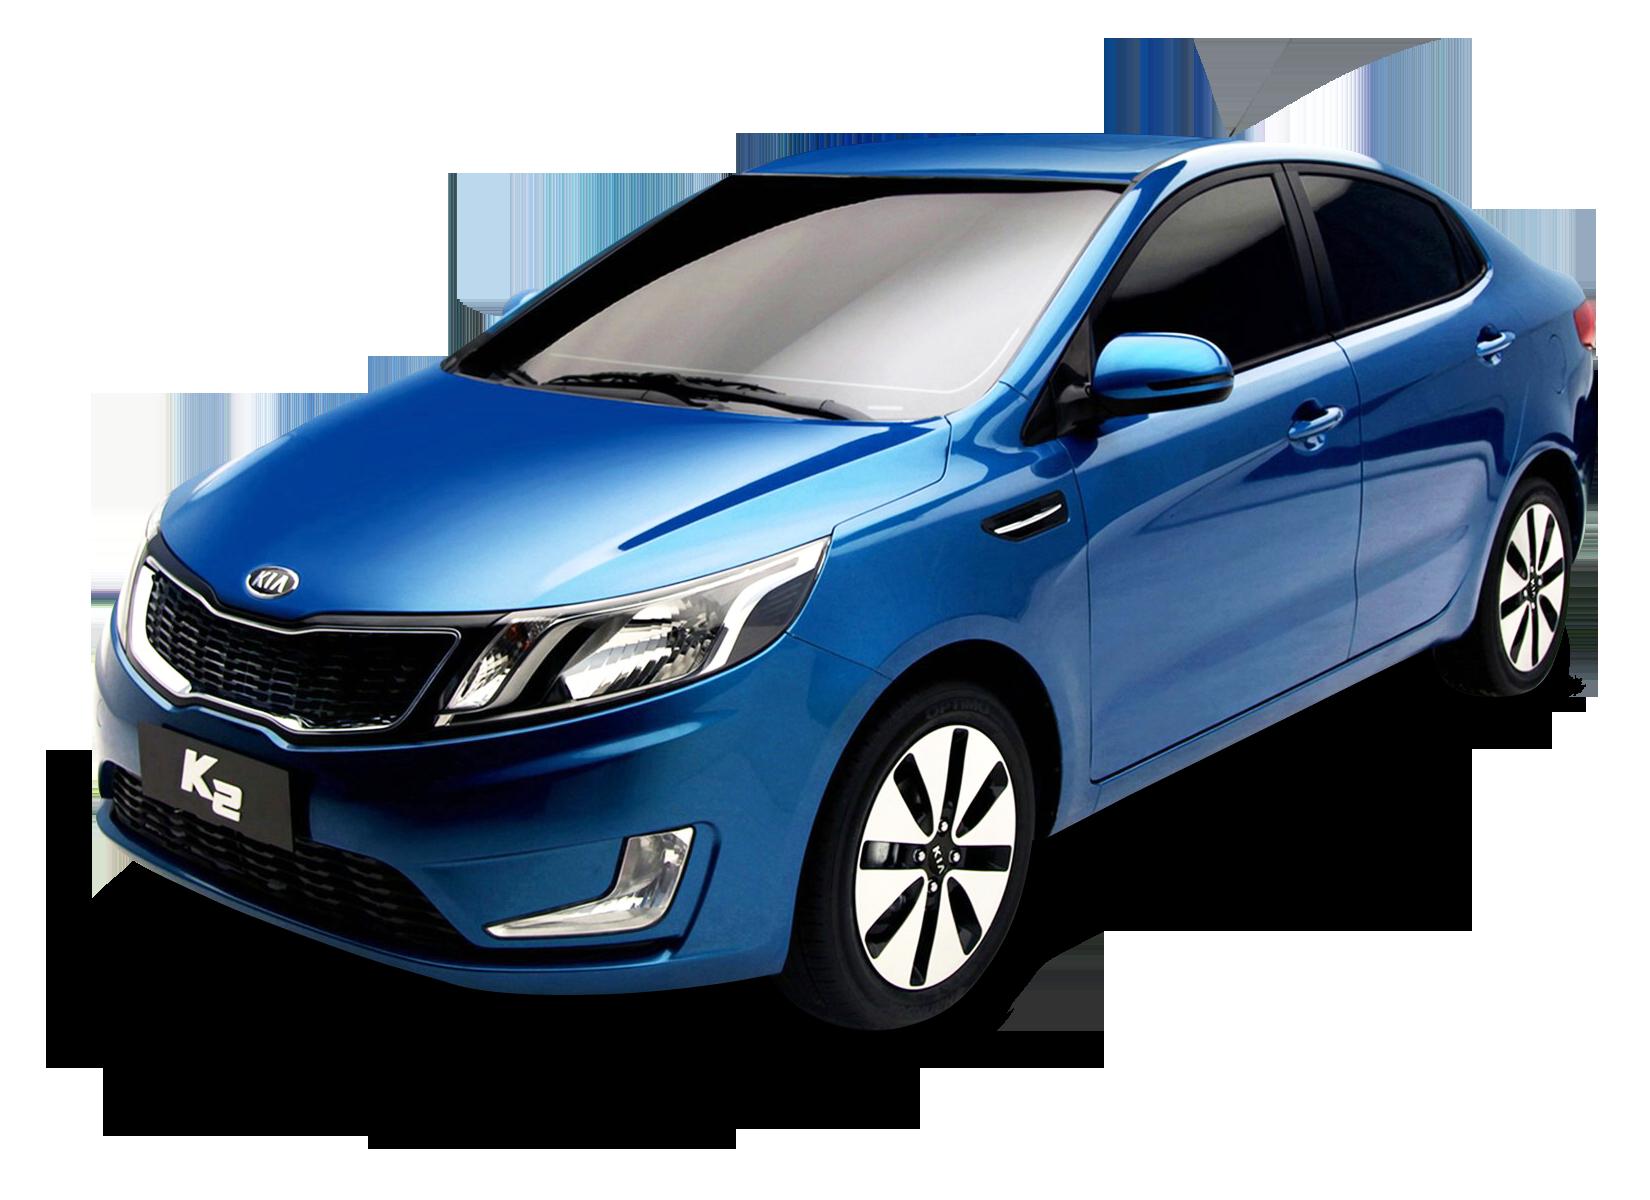 Blue Kia K2 Car